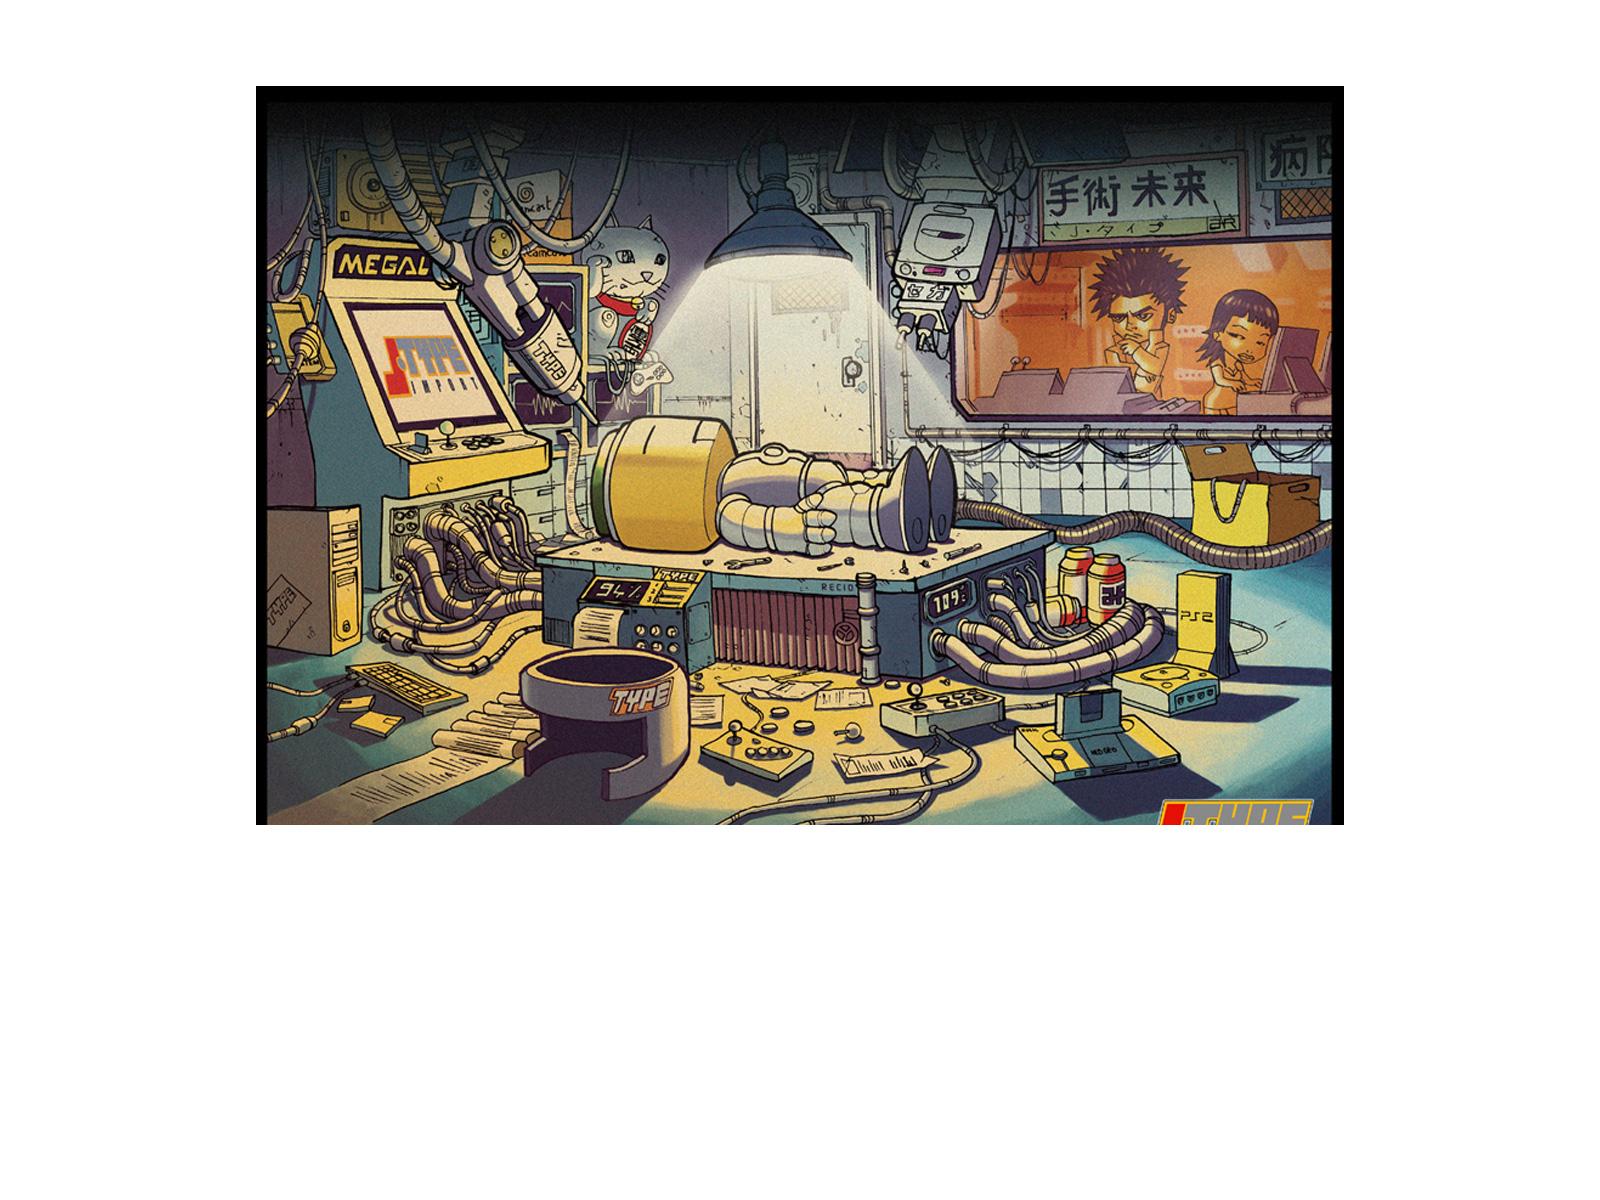 RECIOAlfonso-Illustrations-1025